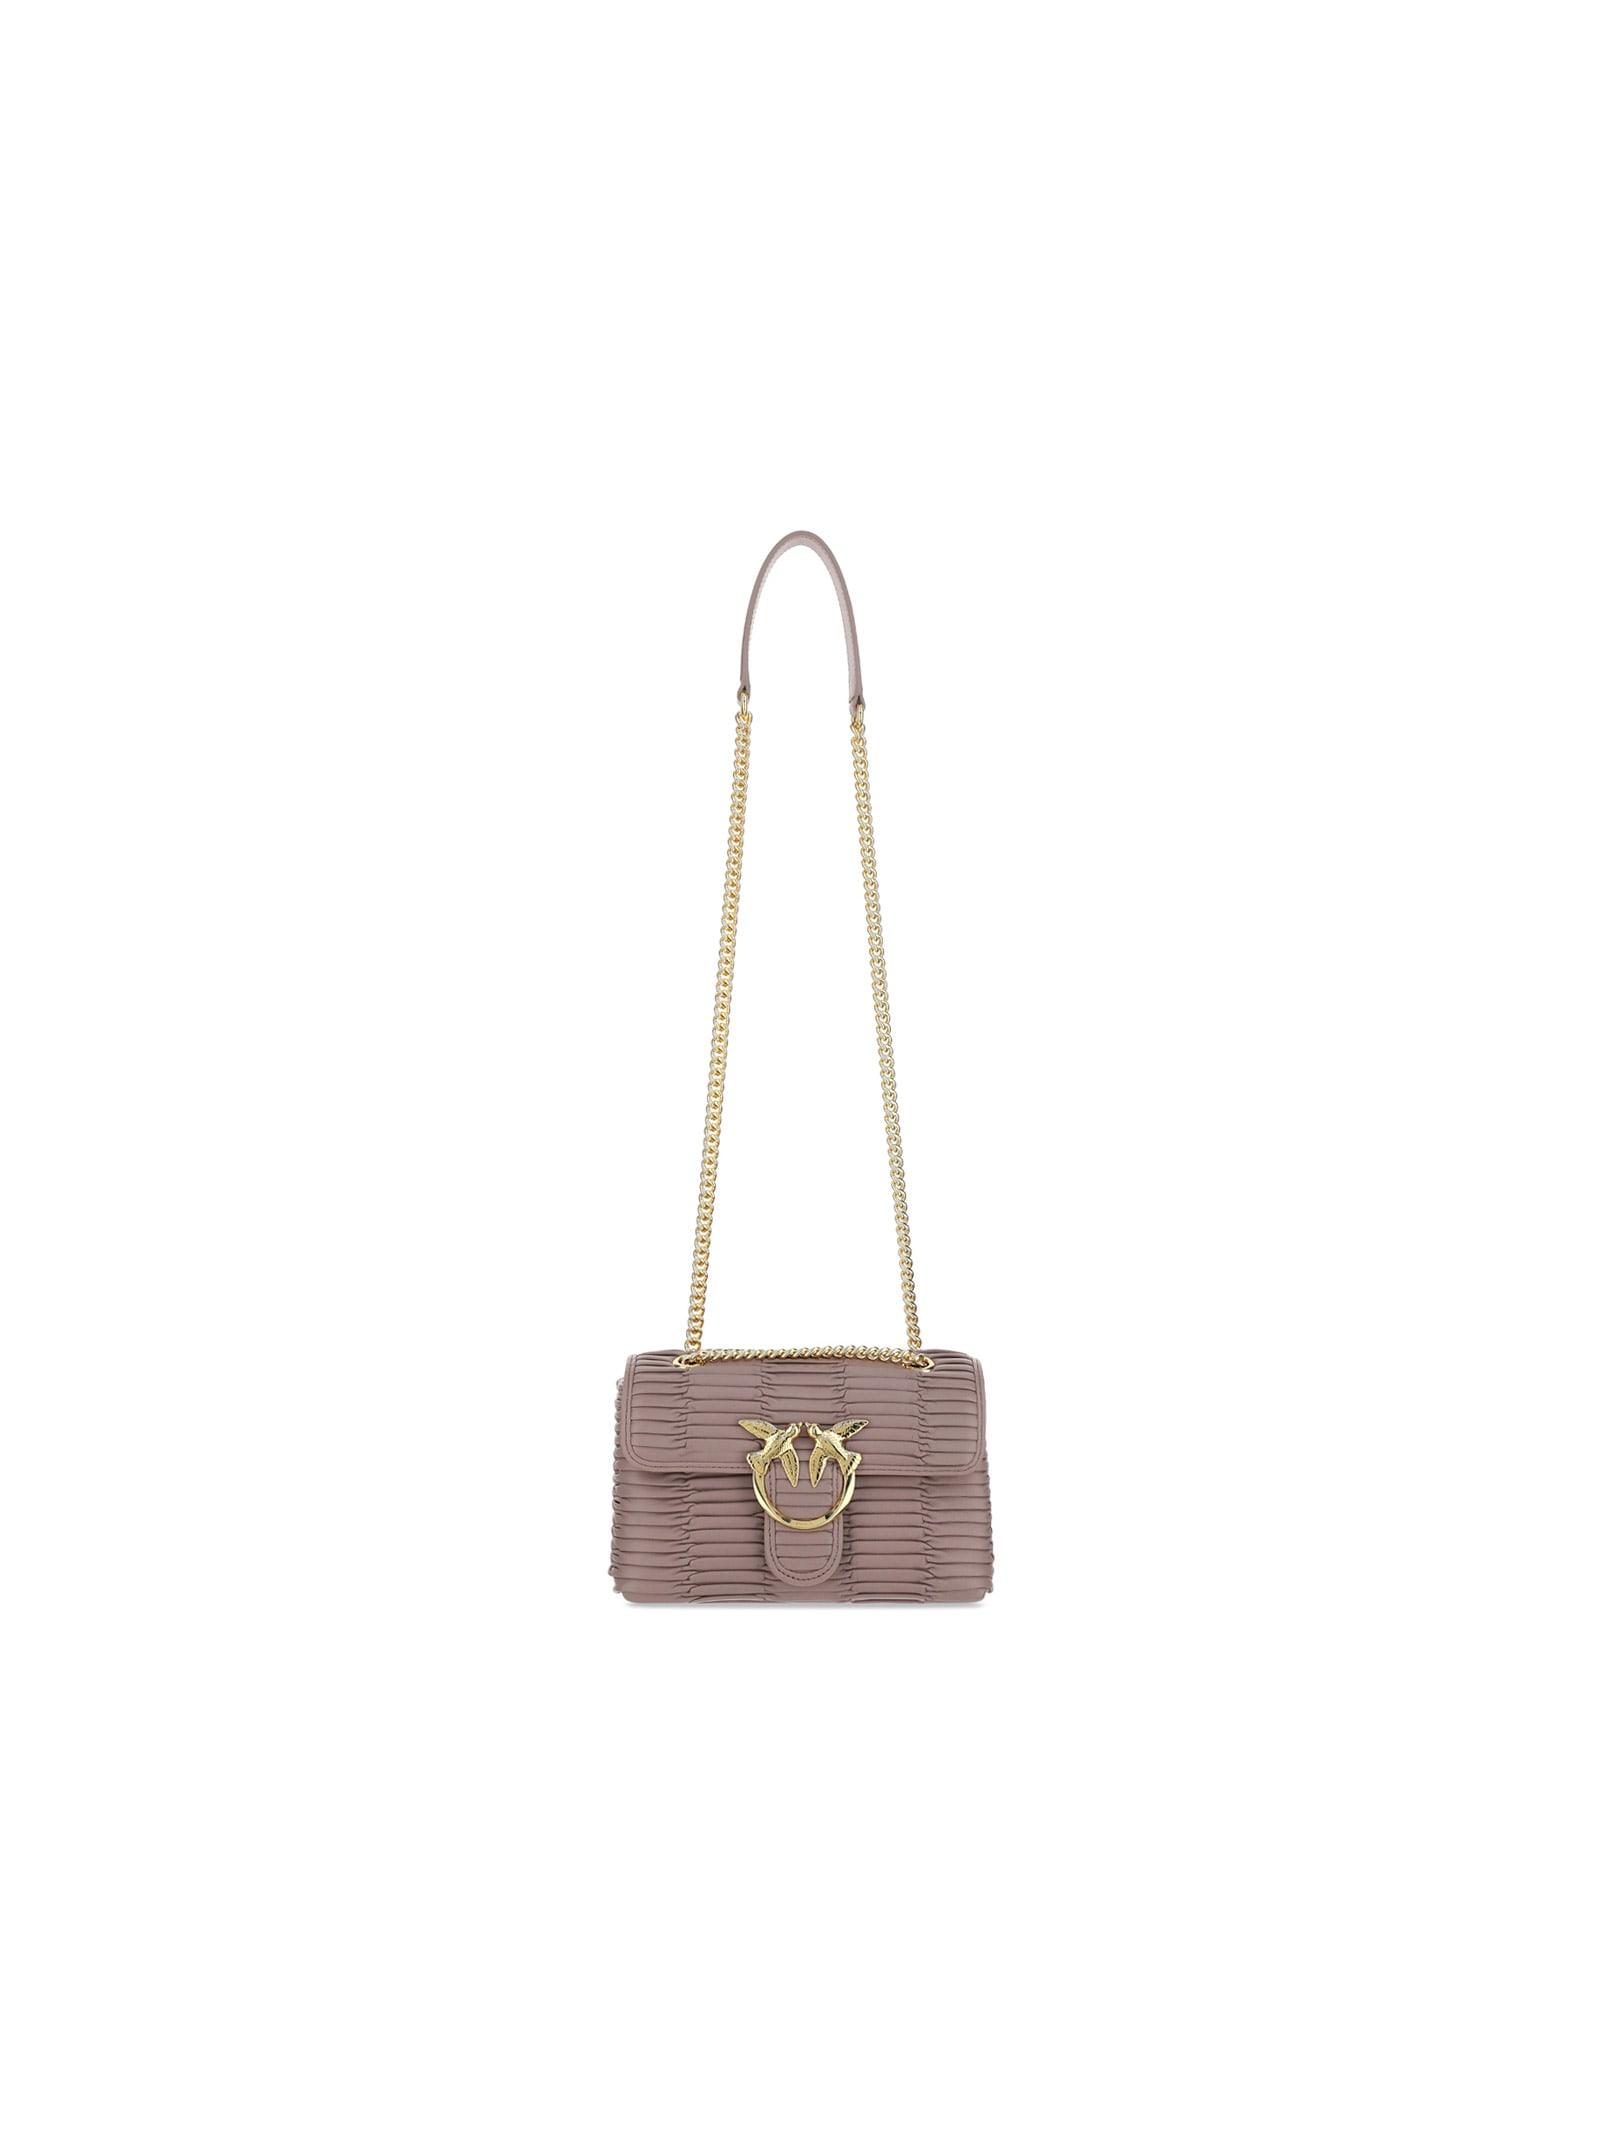 Pinko Leathers LOVE MINI SHOULDER BAG